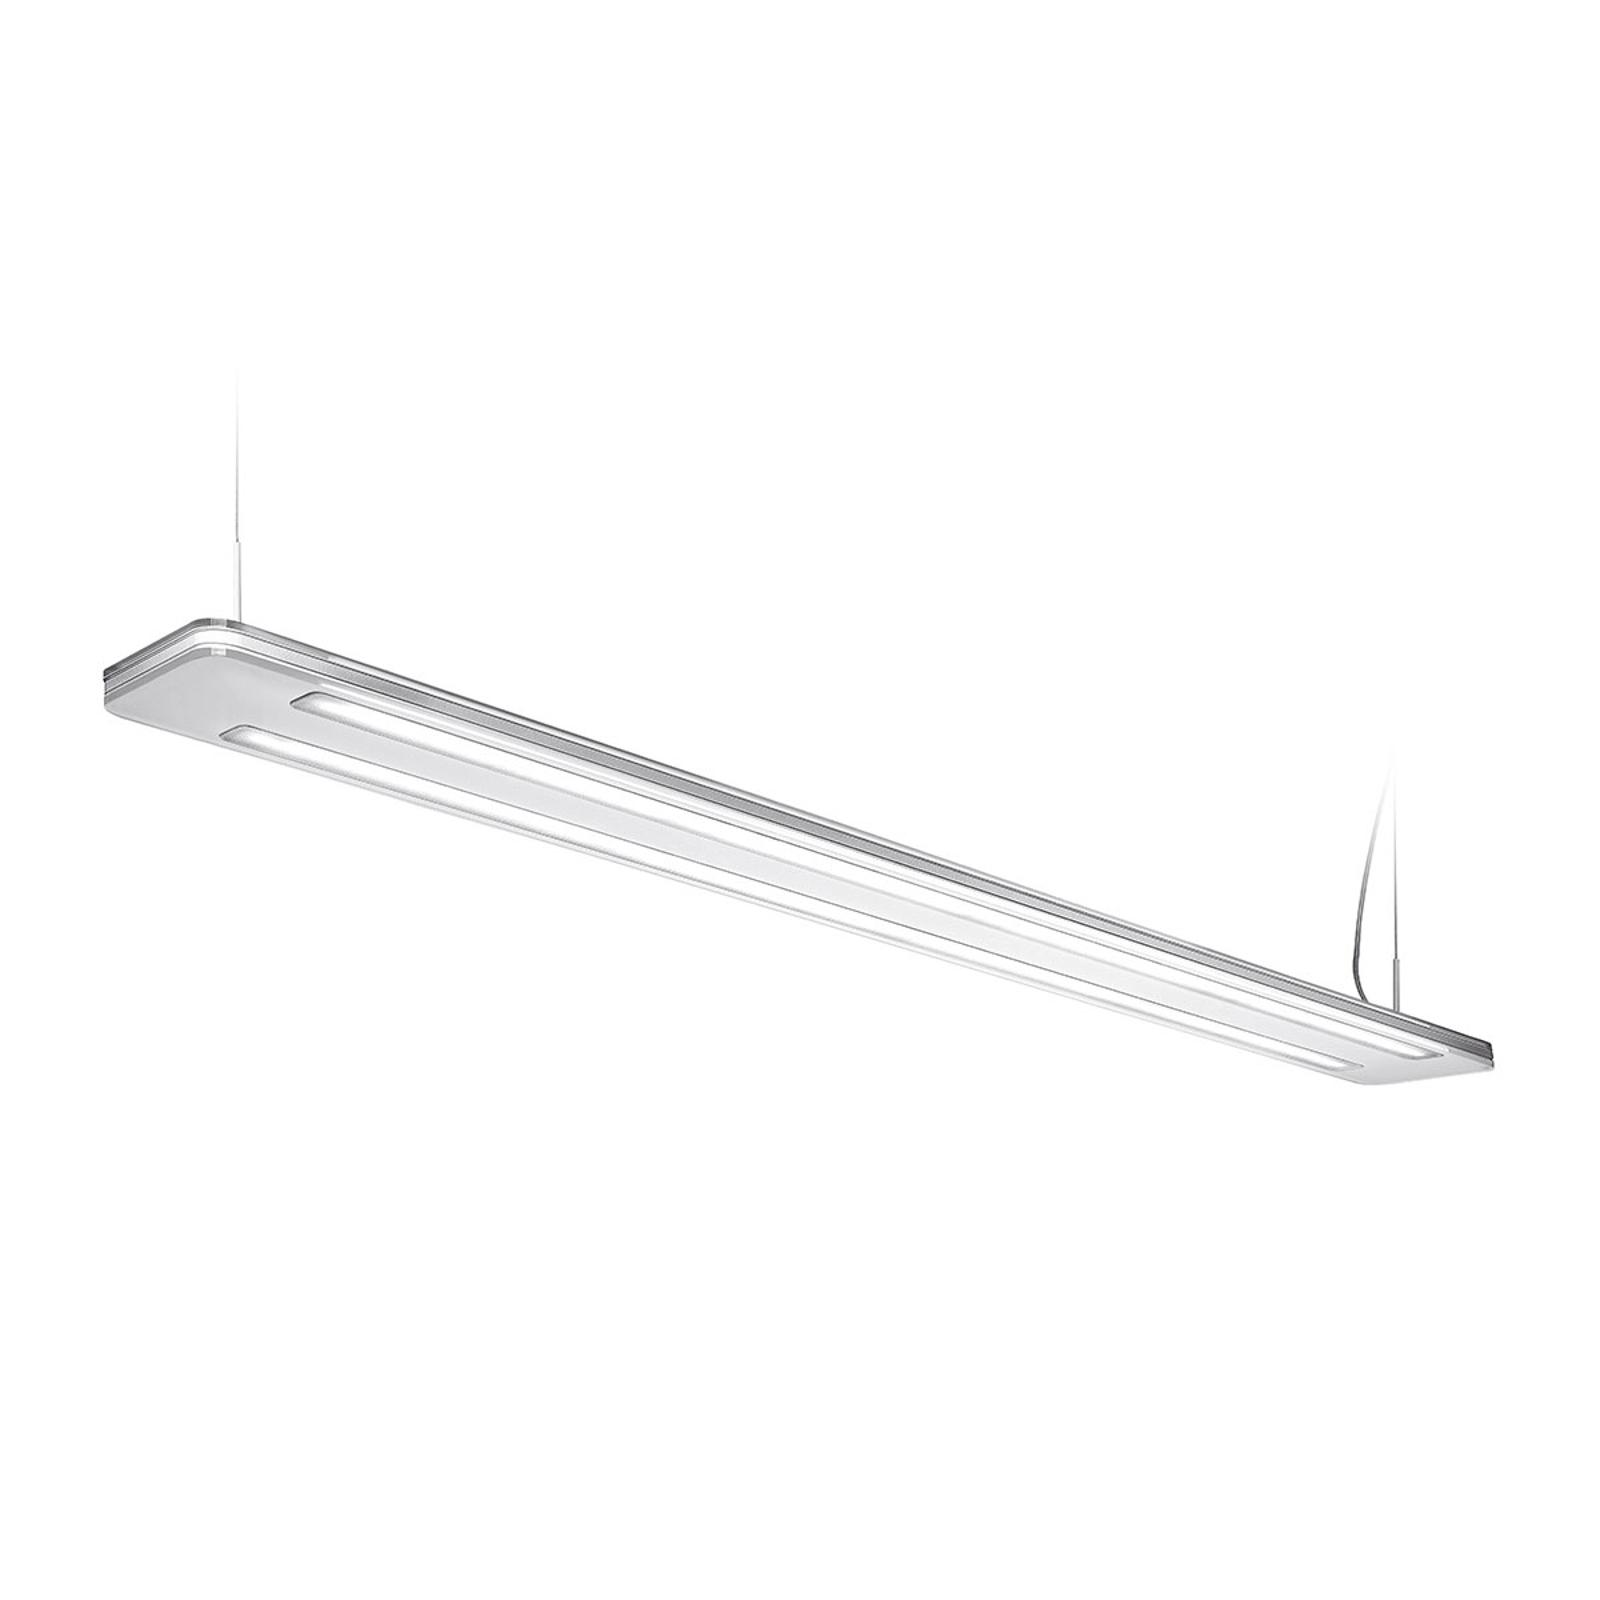 LED hanglamp Trentino II, 83 W, wit